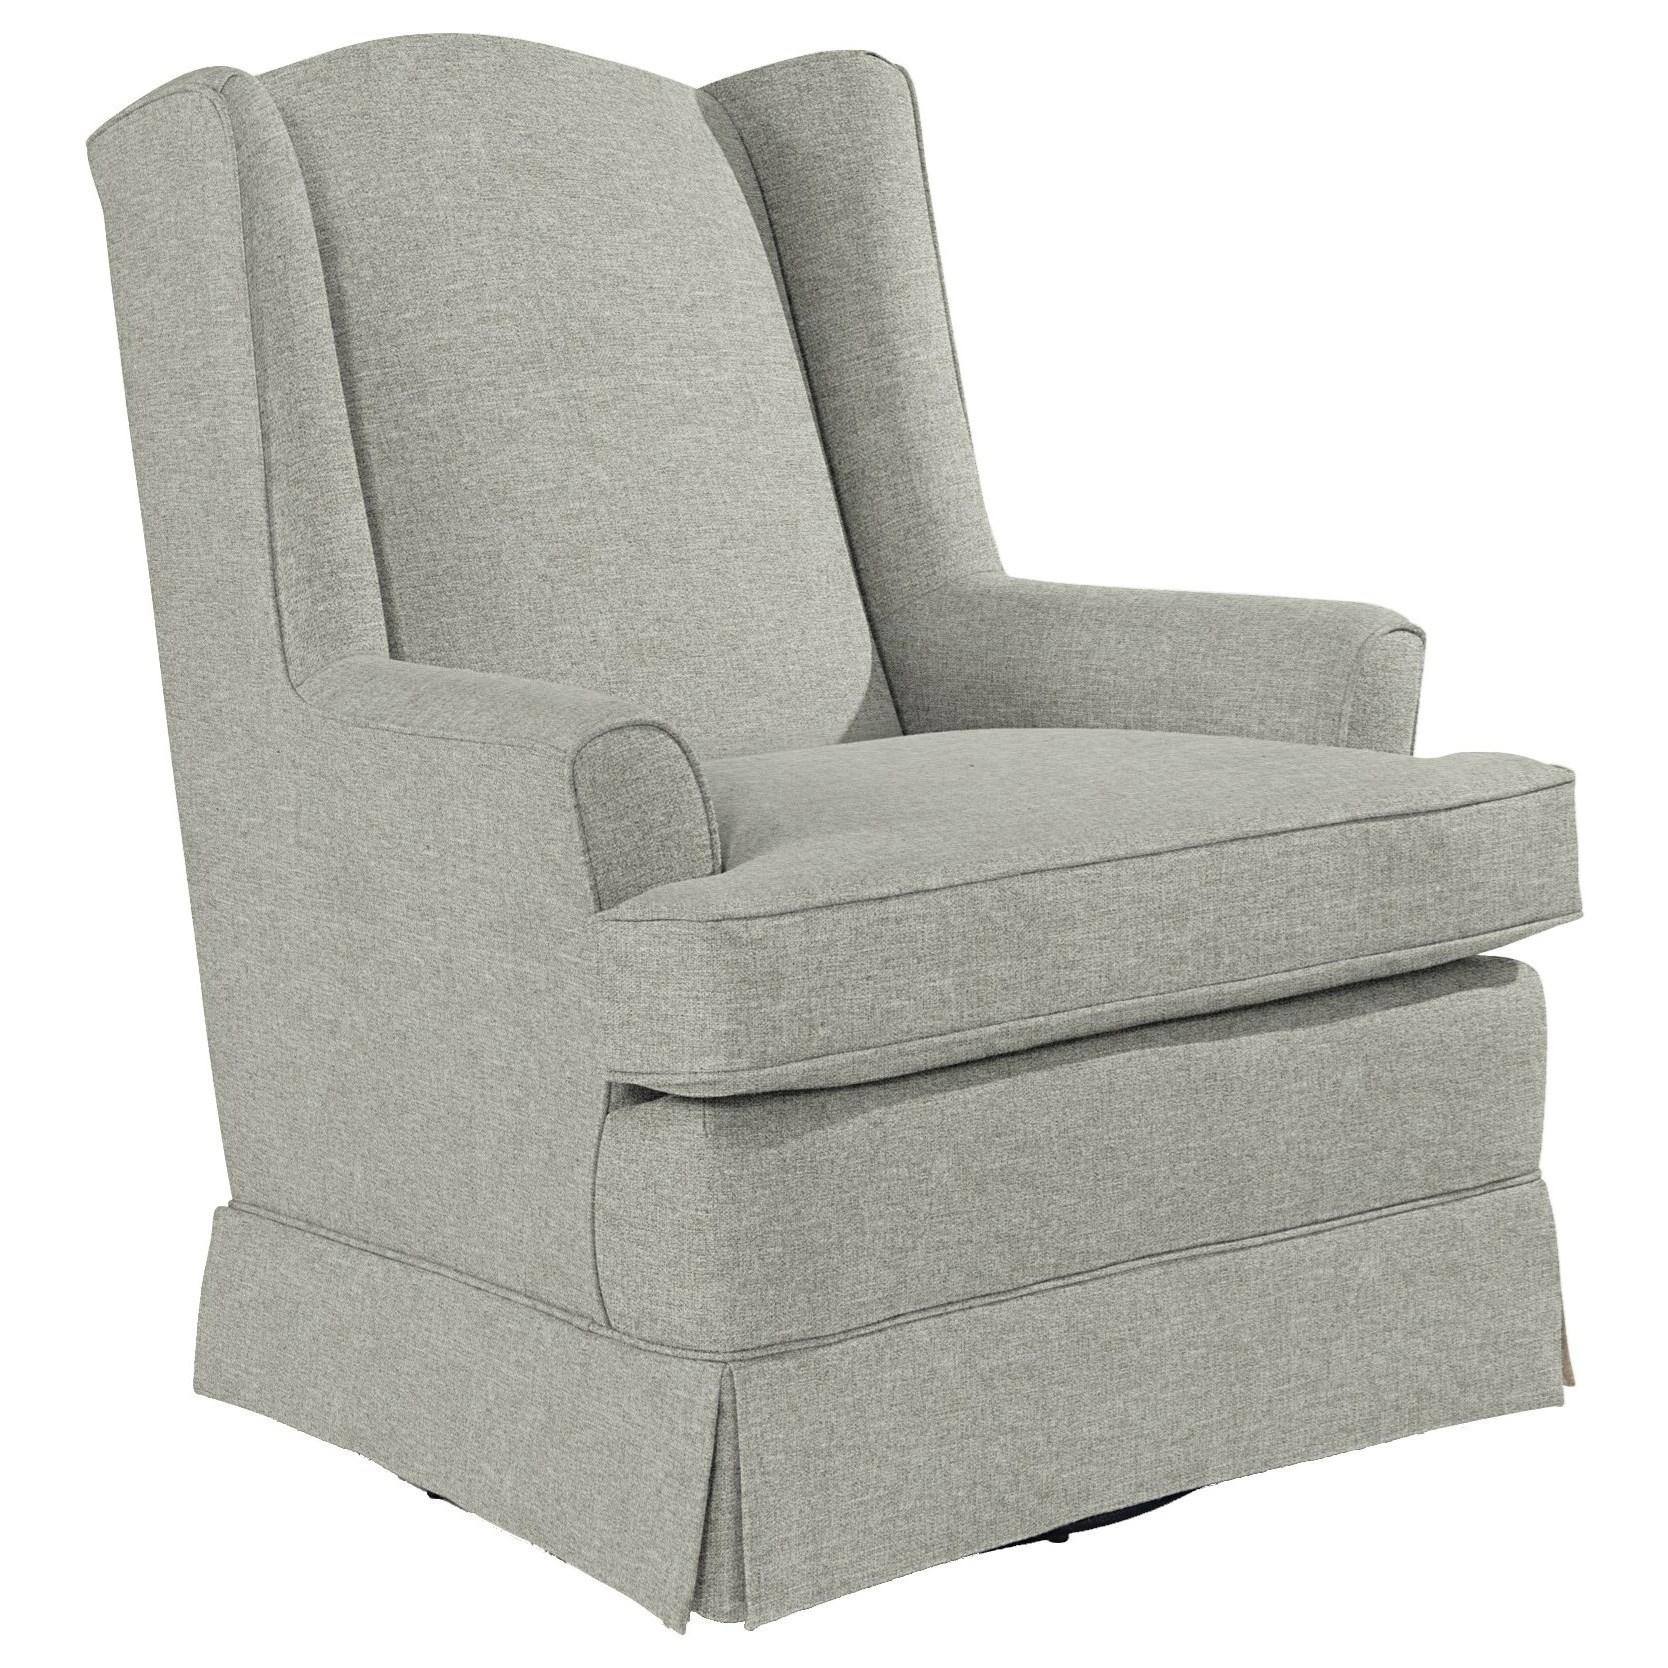 Best Home Furnishings Chairs - Swivel Glide Natasha Swivel Glider - Item Number: 7147-21649